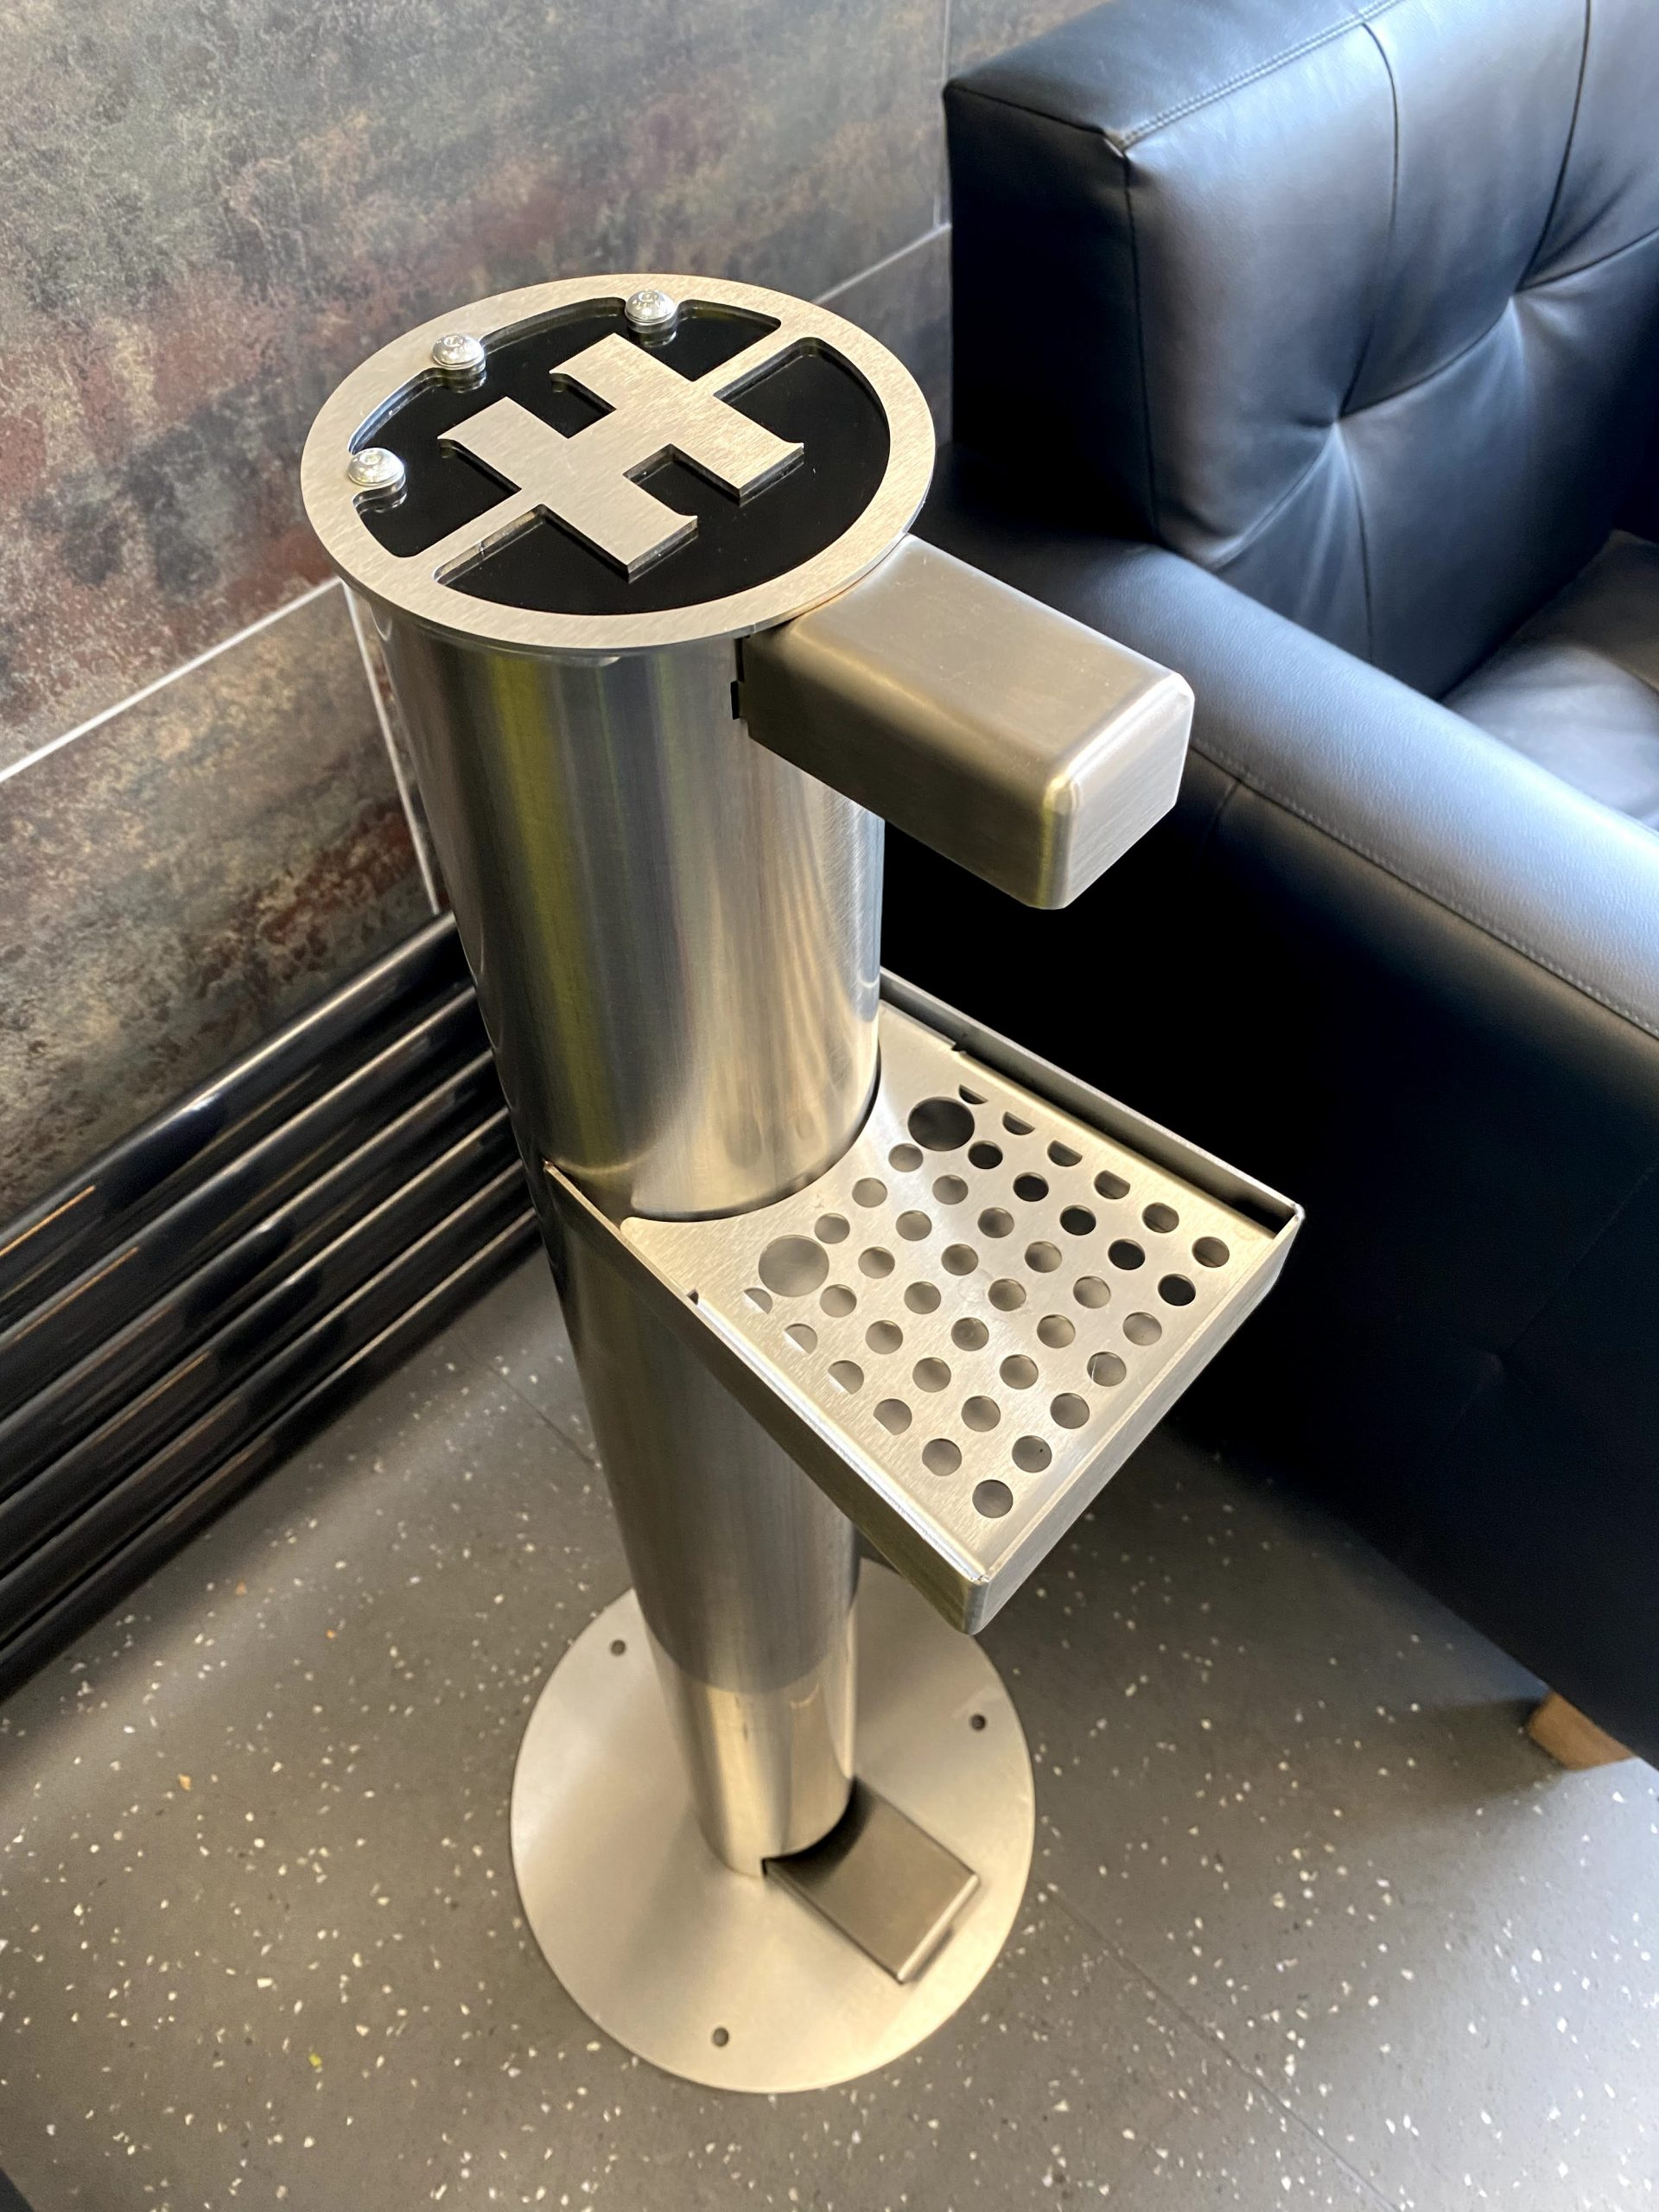 H360 Products hand sanitiser dispenser